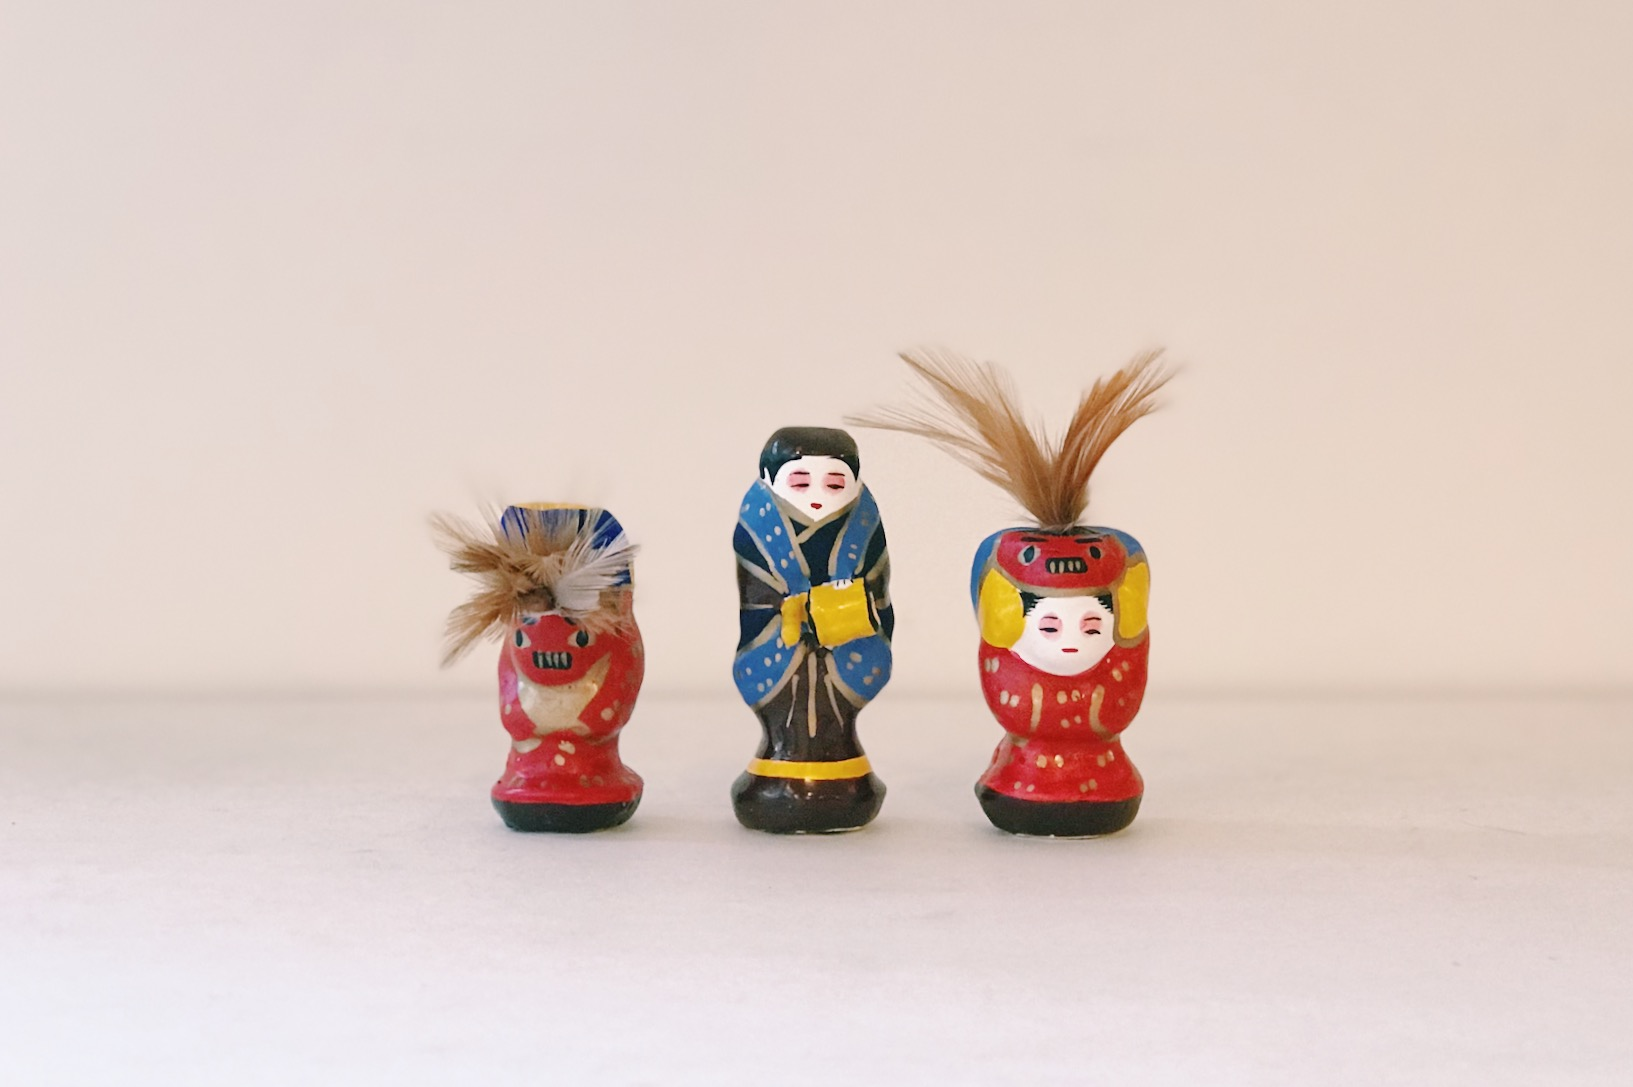 http://www.schule.jp/hibinokoto/76A0CDDA-208D-40A9-AEEA-B6085A7AE883.JPG